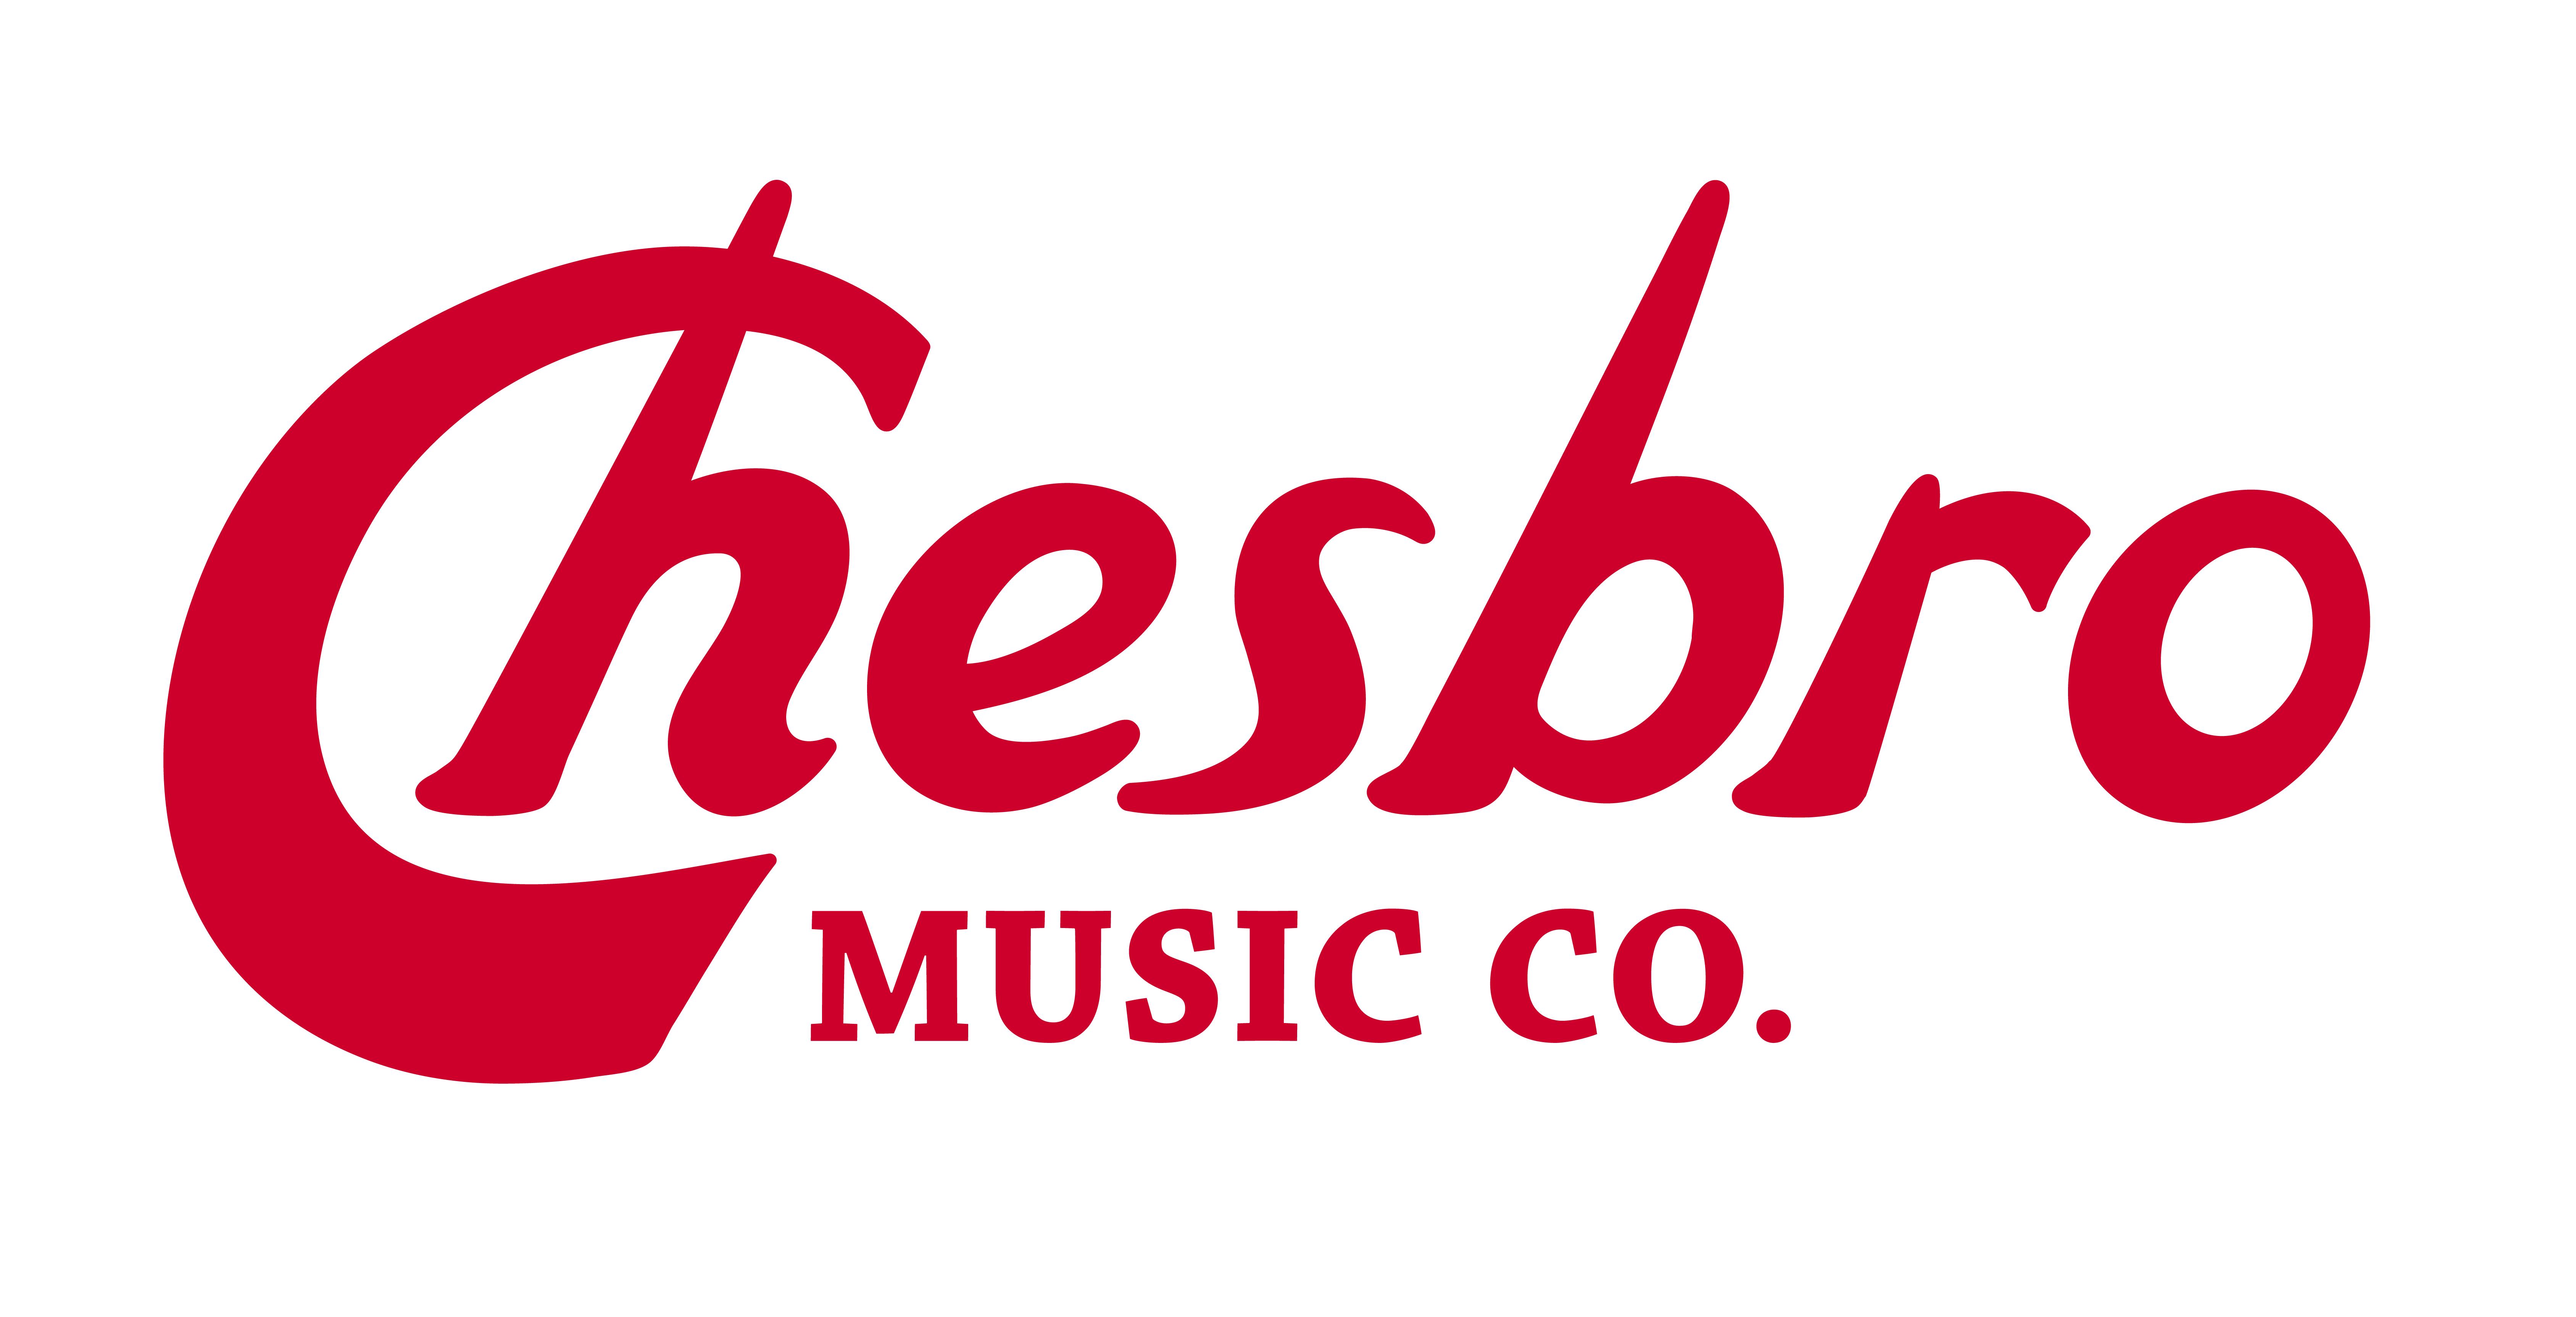 Chesbro Wholesale